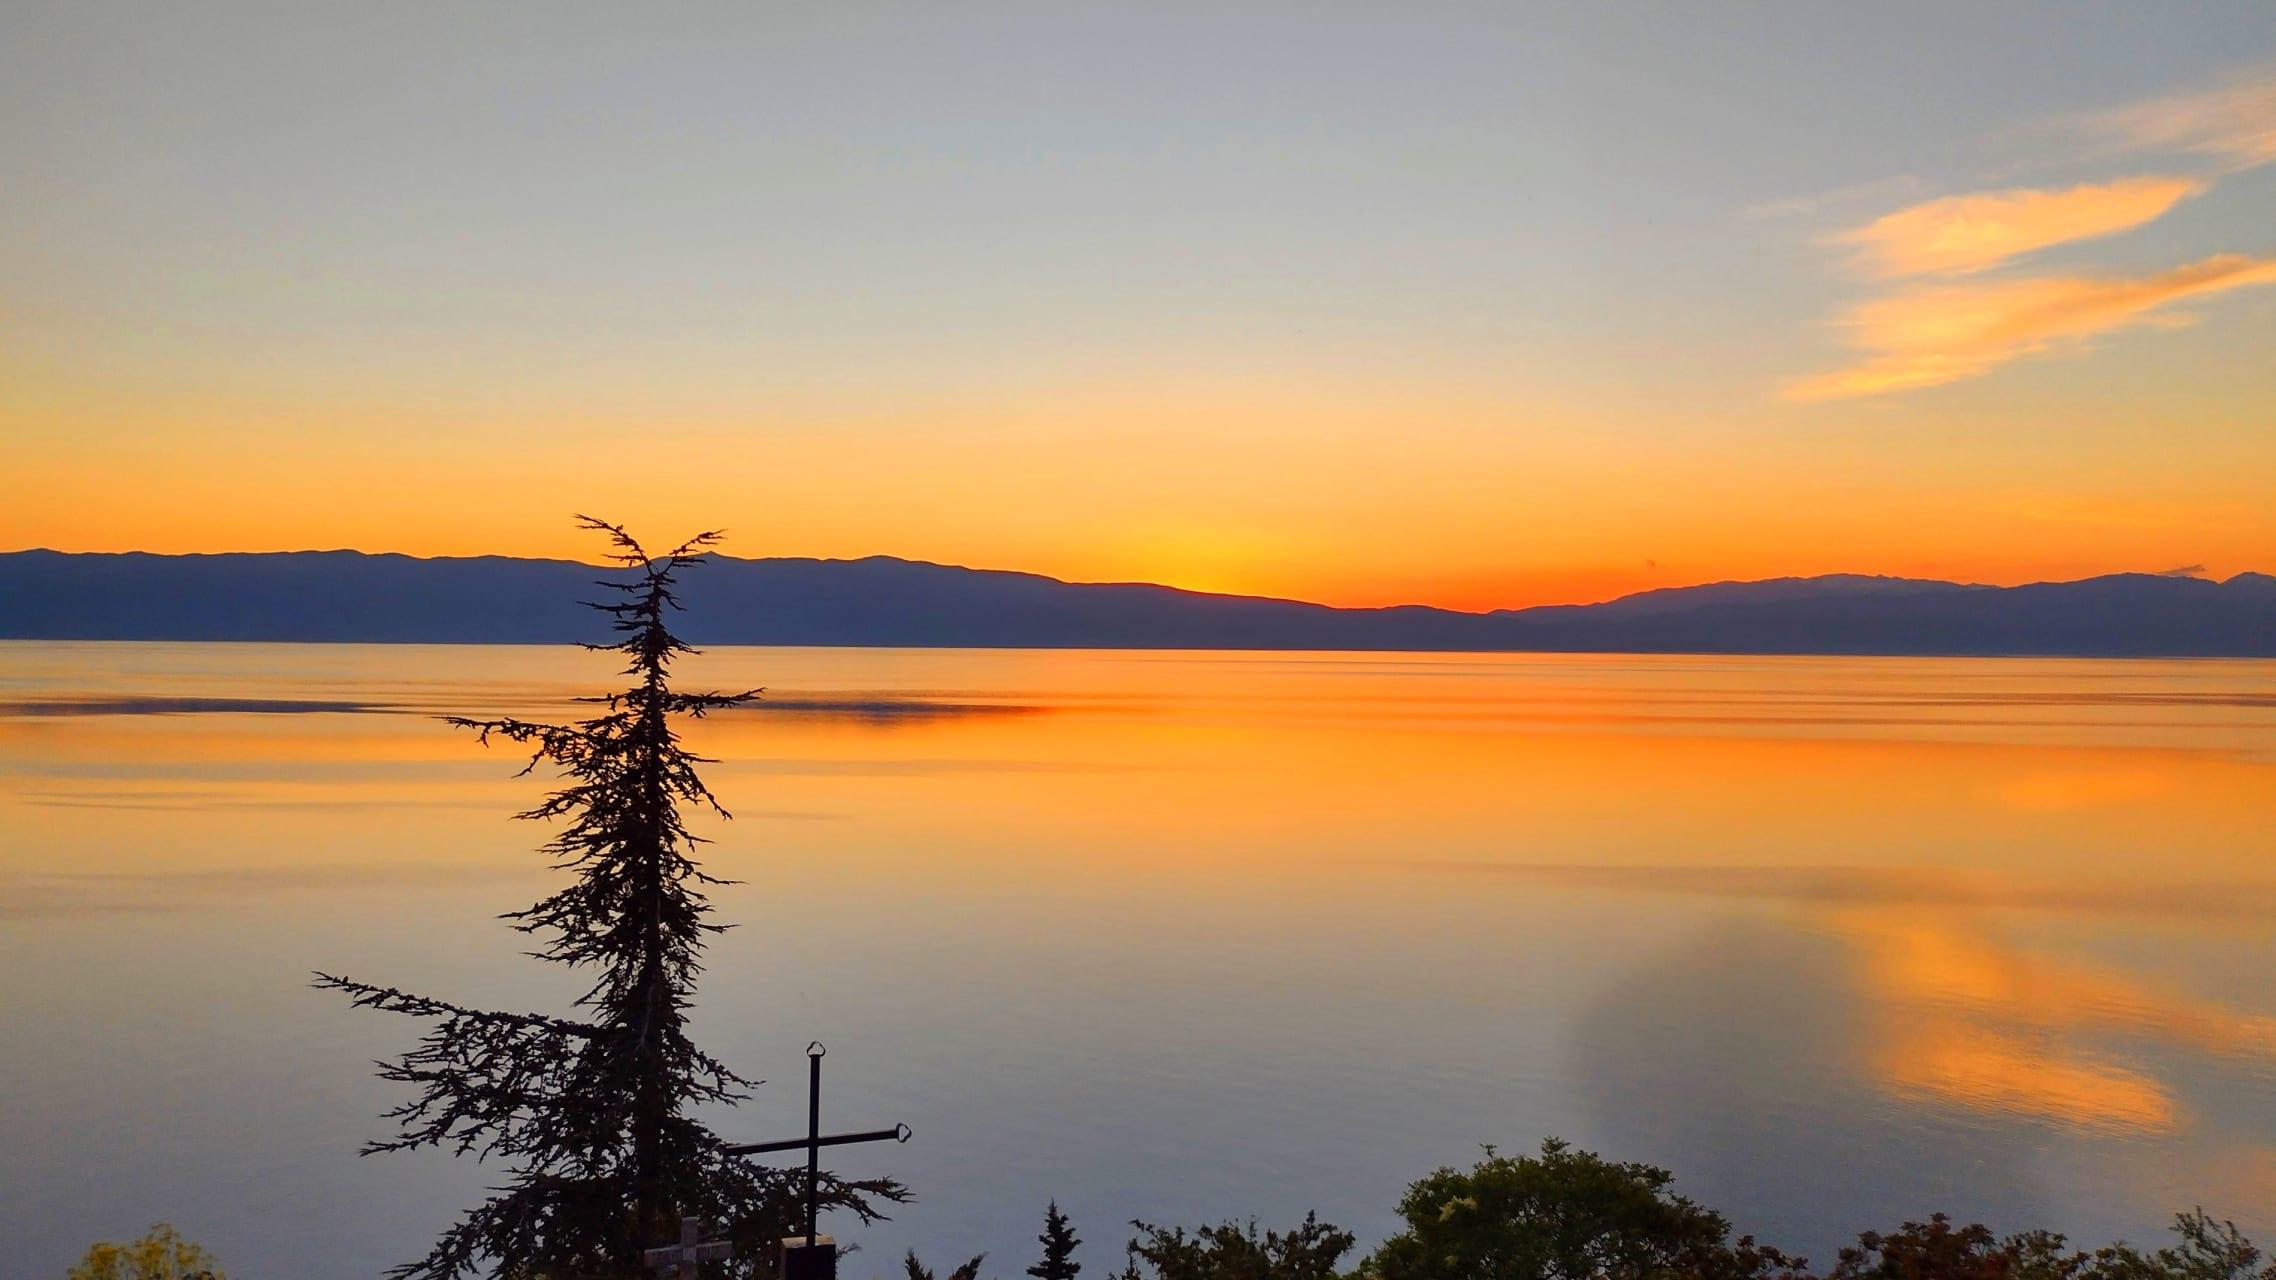 Ohrid - Magical Sunset Over Ohrid Lake